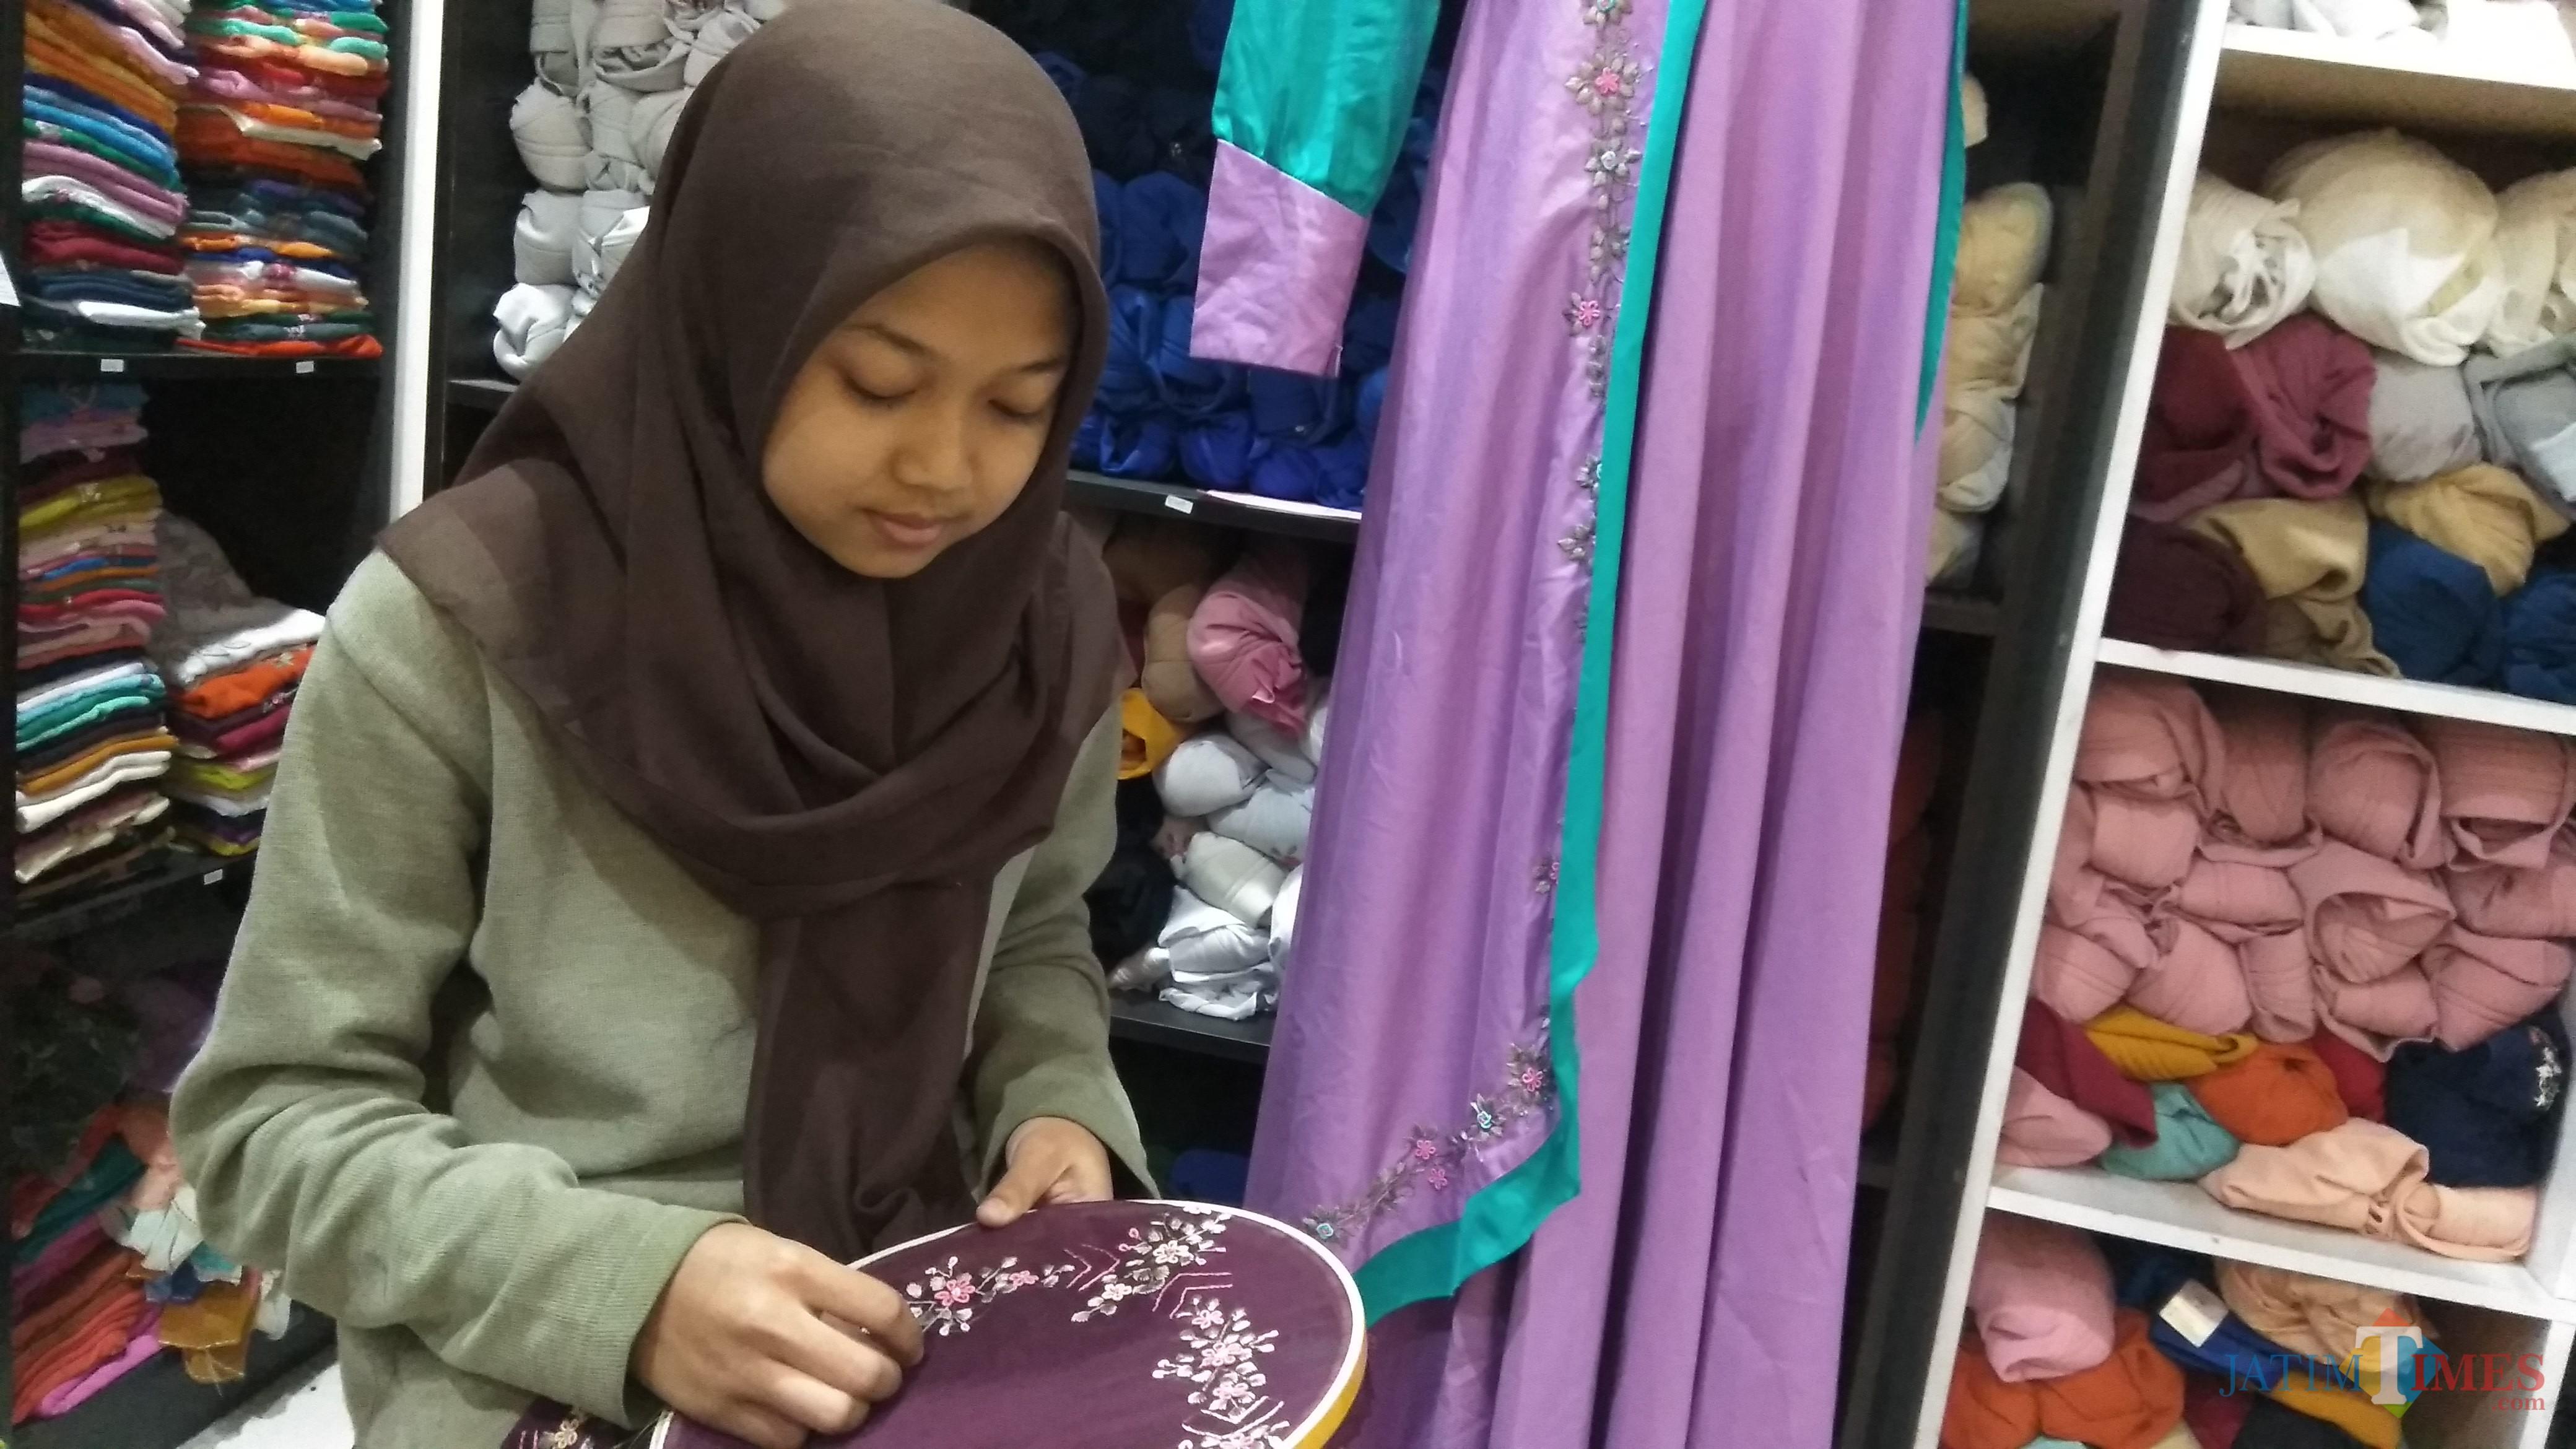 Perajin tengah menyulam hiasan di kerudung di rumah fashion Almira Handmade, Kota Malang. (Foto: Nurlayla Ratri/MalangTIMES)